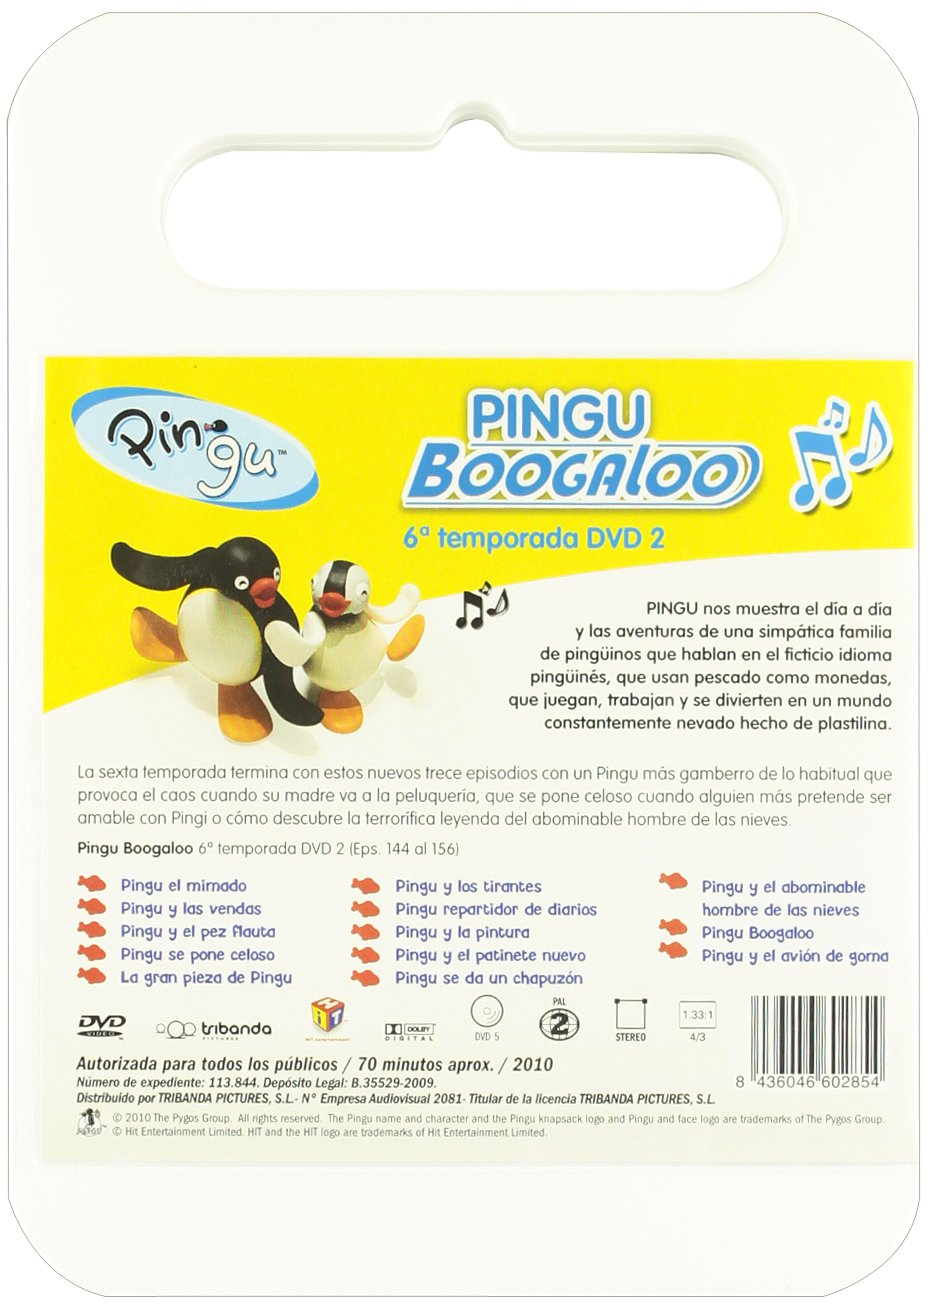 Amazon.com: Pingu 6ª Temp. - Pingu Boogaloo Dvd 2 [Import ...